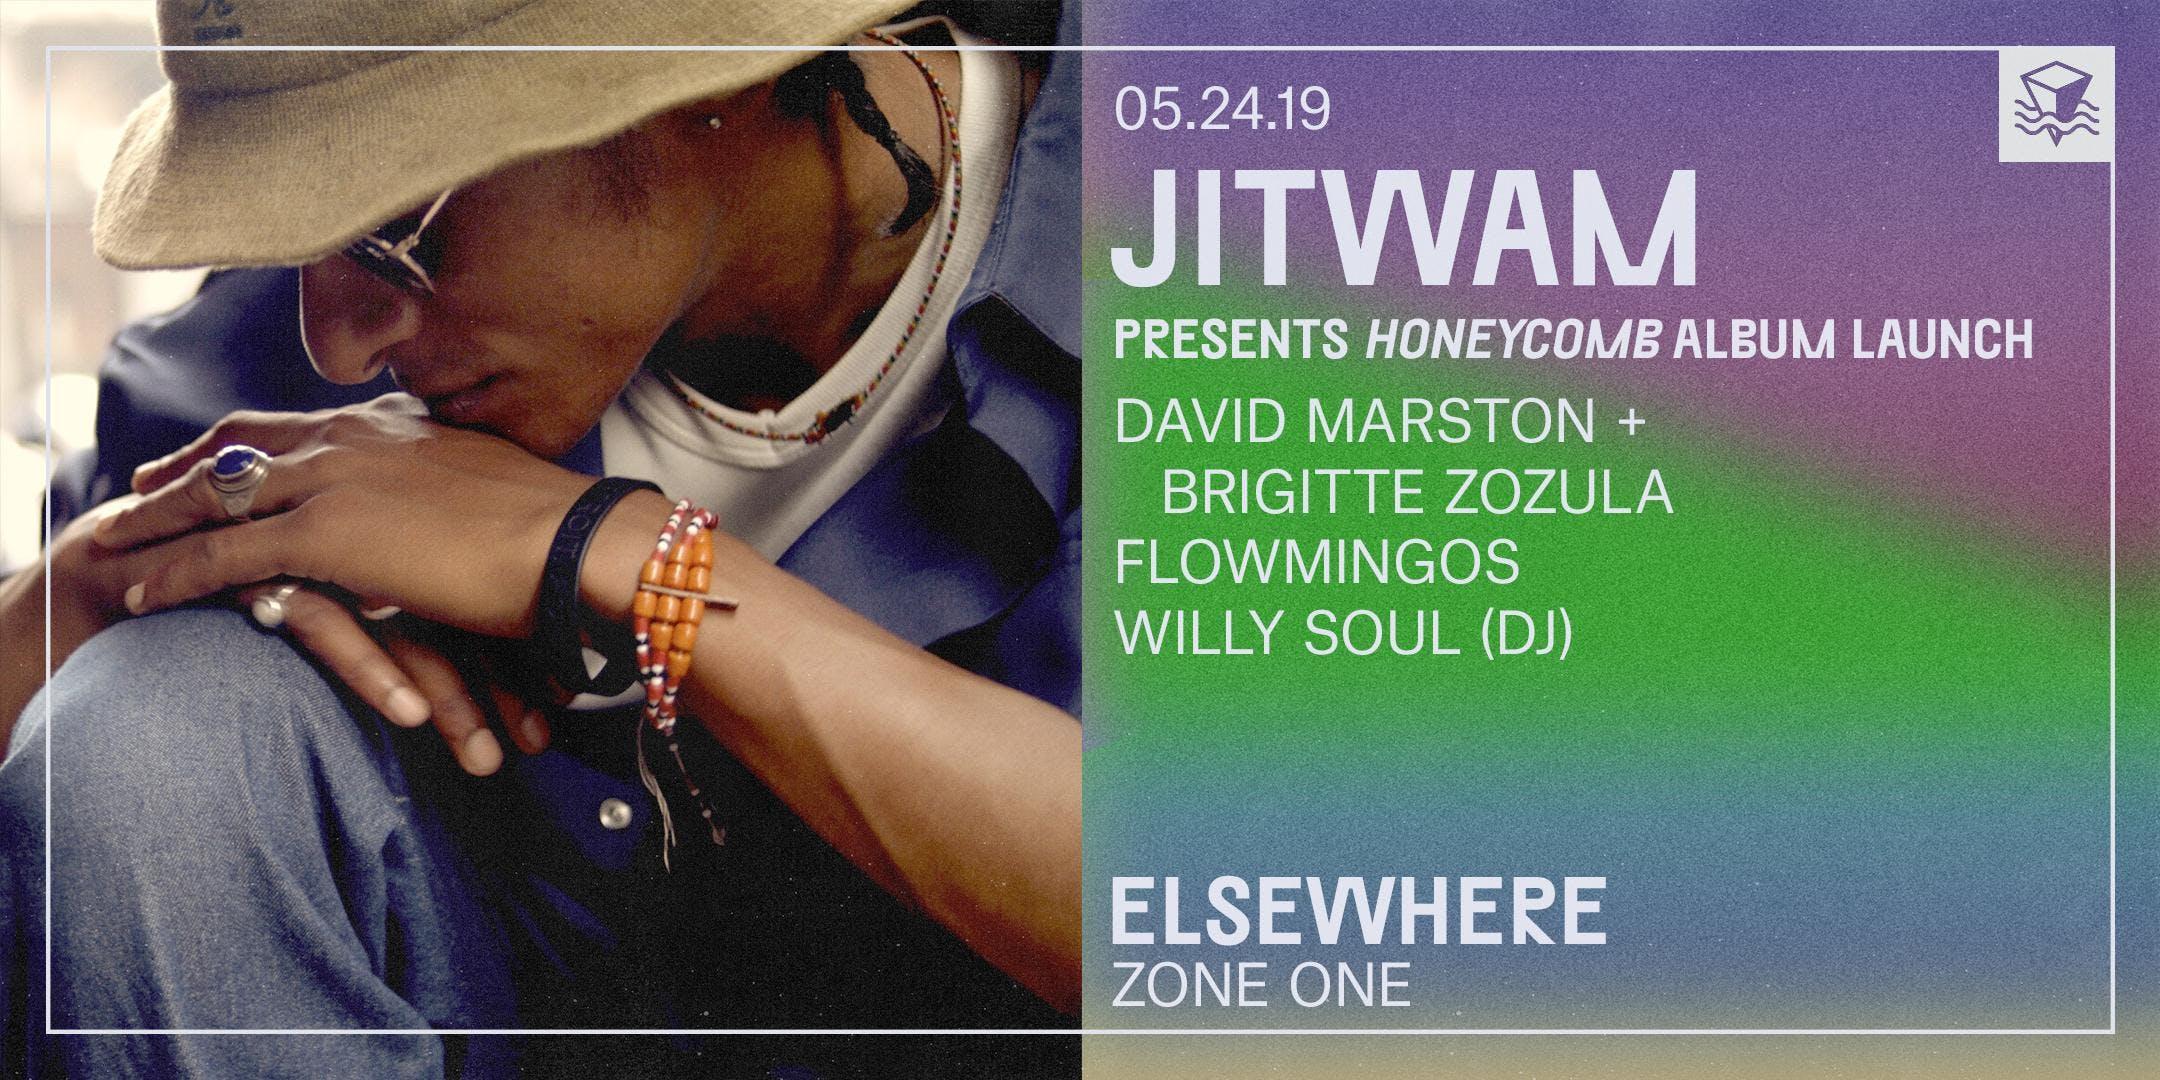 Jitwam Presents 'Honeycomb' Album Launch